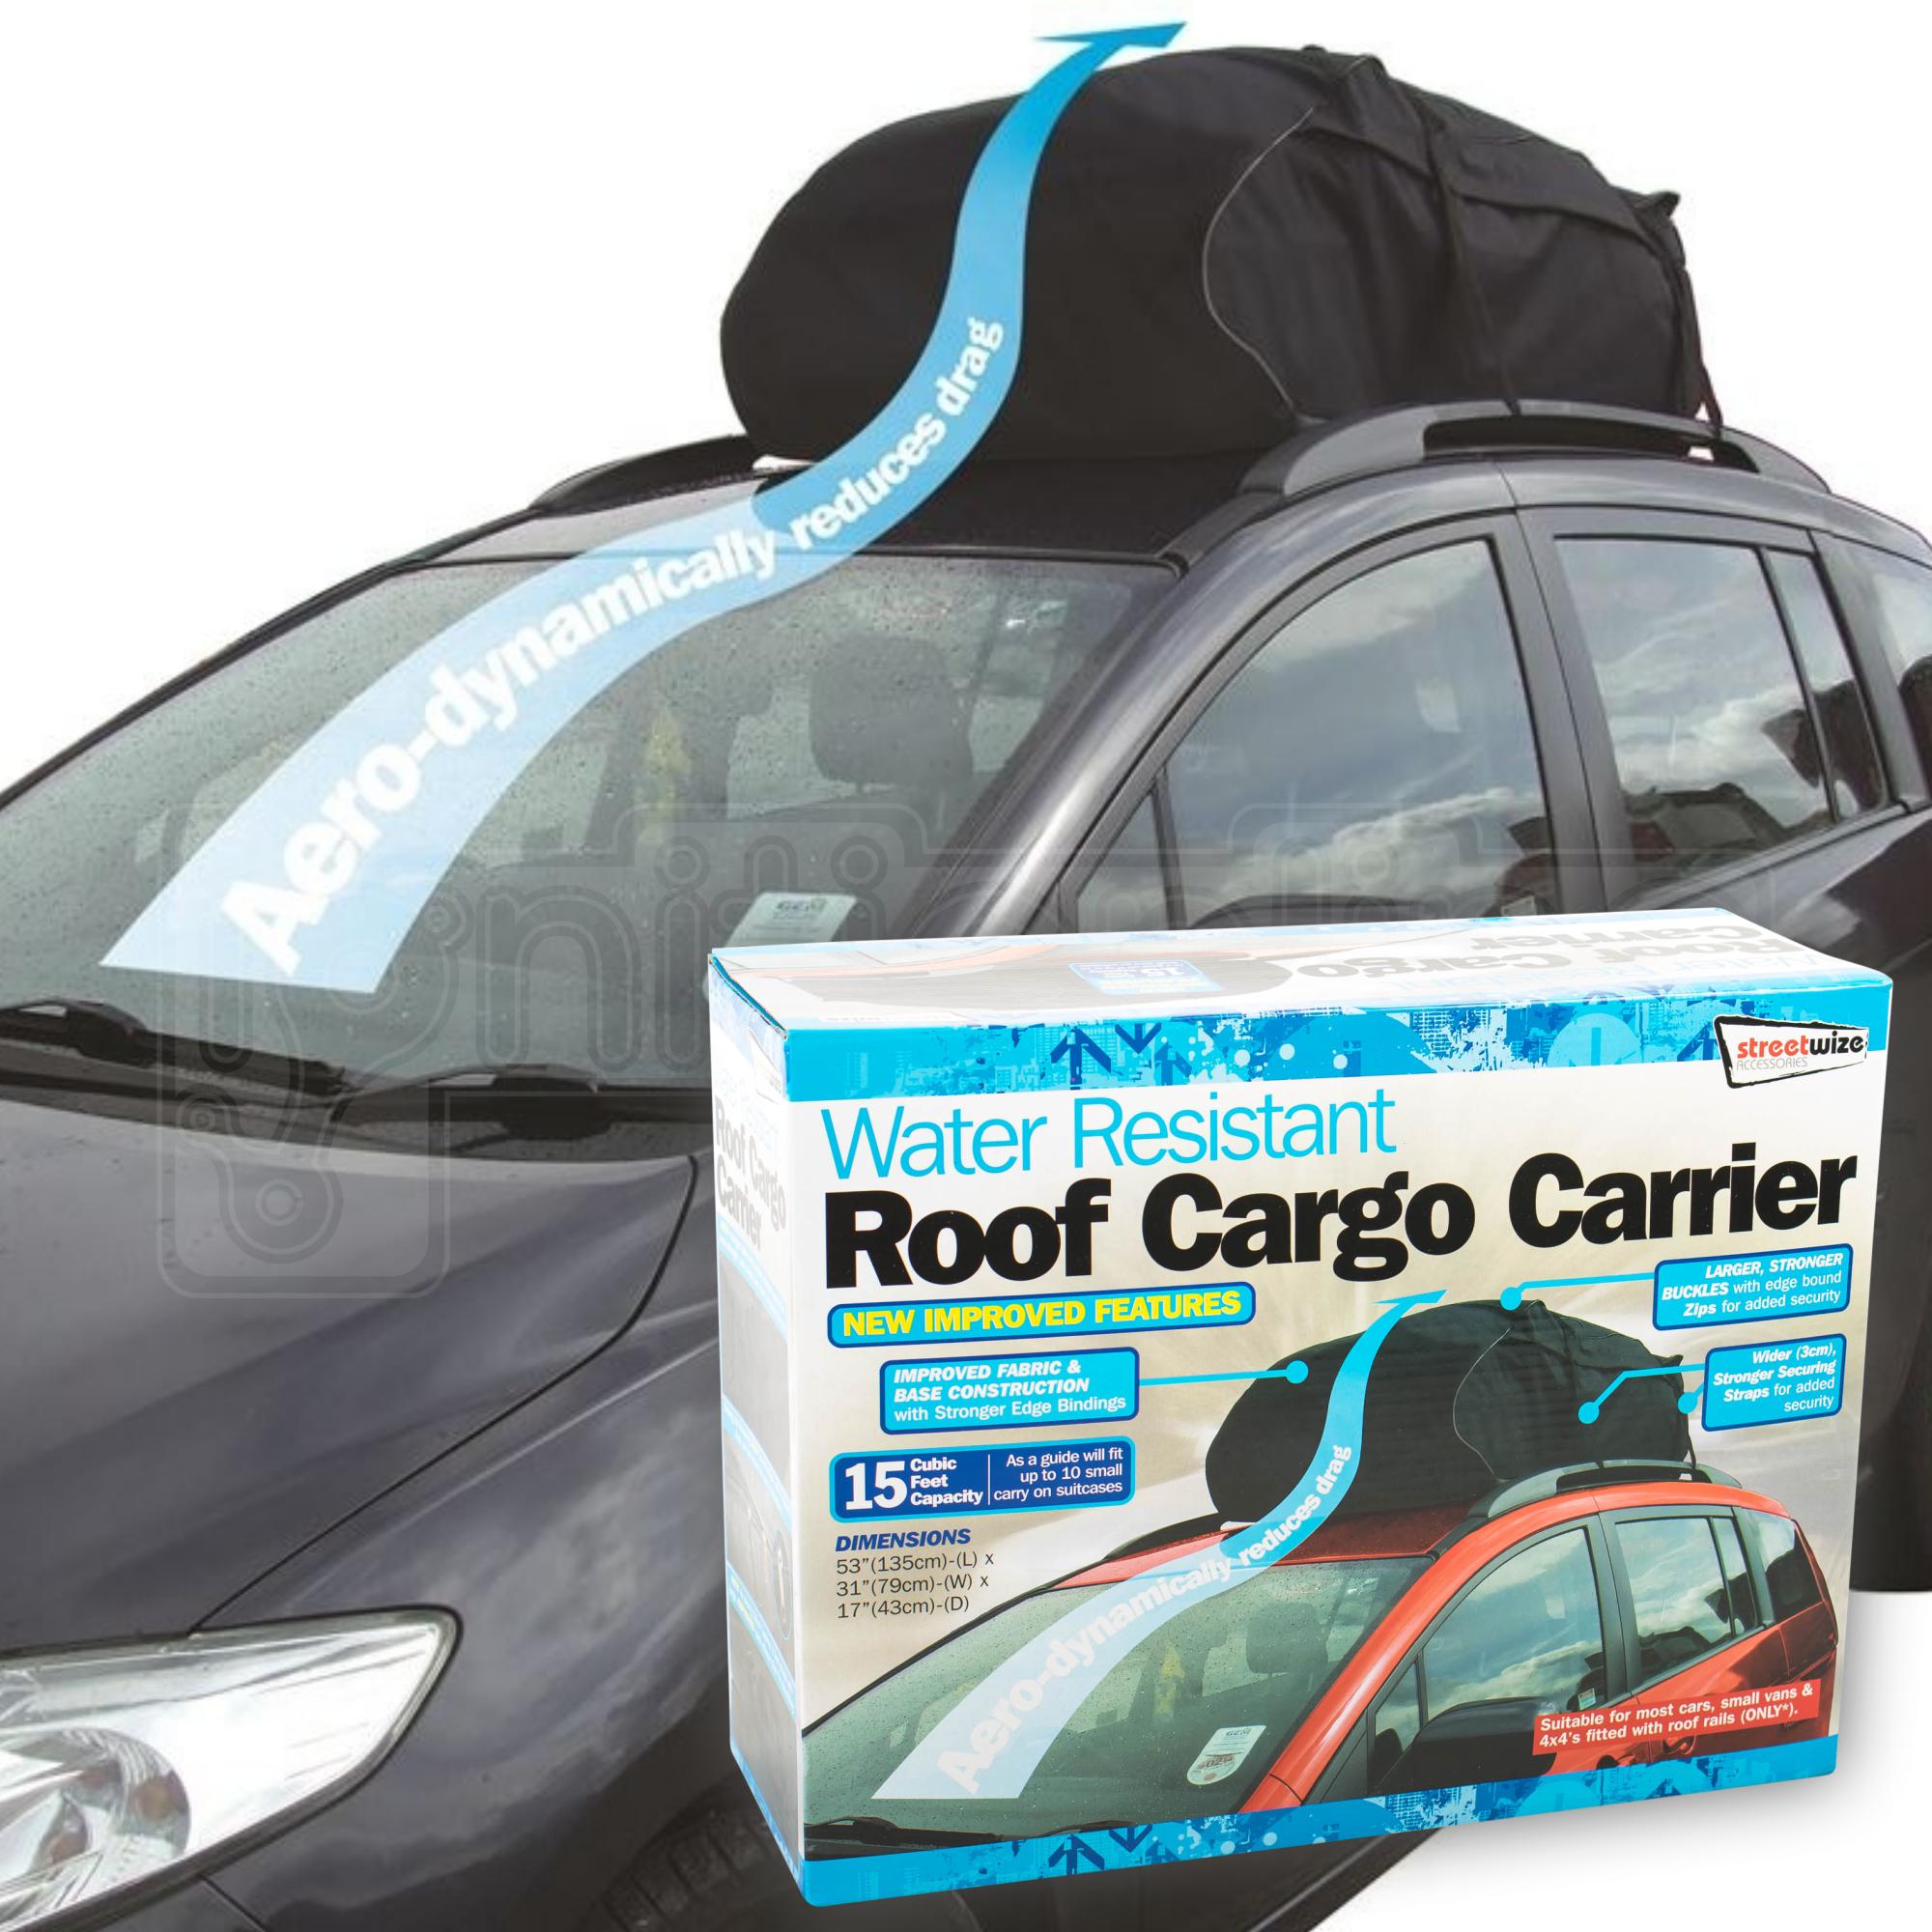 Car Top Carrier 17 Cubic Feet Waterproof Cargo Carrier Heavy Duty Traps Rooftop Cargo Carrier for All Vehicles Cargo Bag Box Storage Luggage